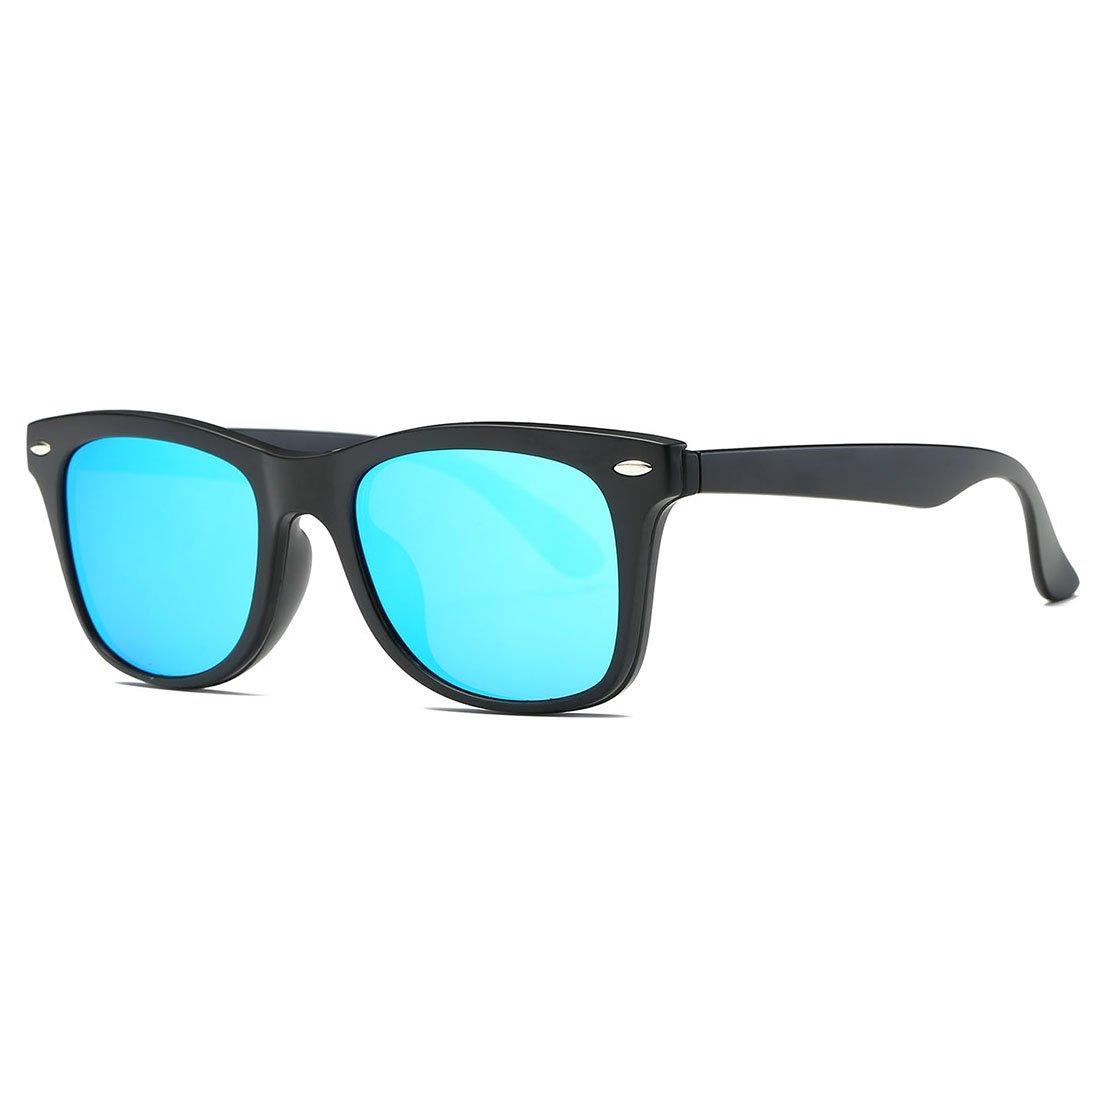 6d2bab2ba2d Galleon - AEVOGUE Magnetic Clip-on Polarized Sunglasses Mens 80 s Retro  TR90 Frame Dual Purpose Glasses AE0511 (Black Blue